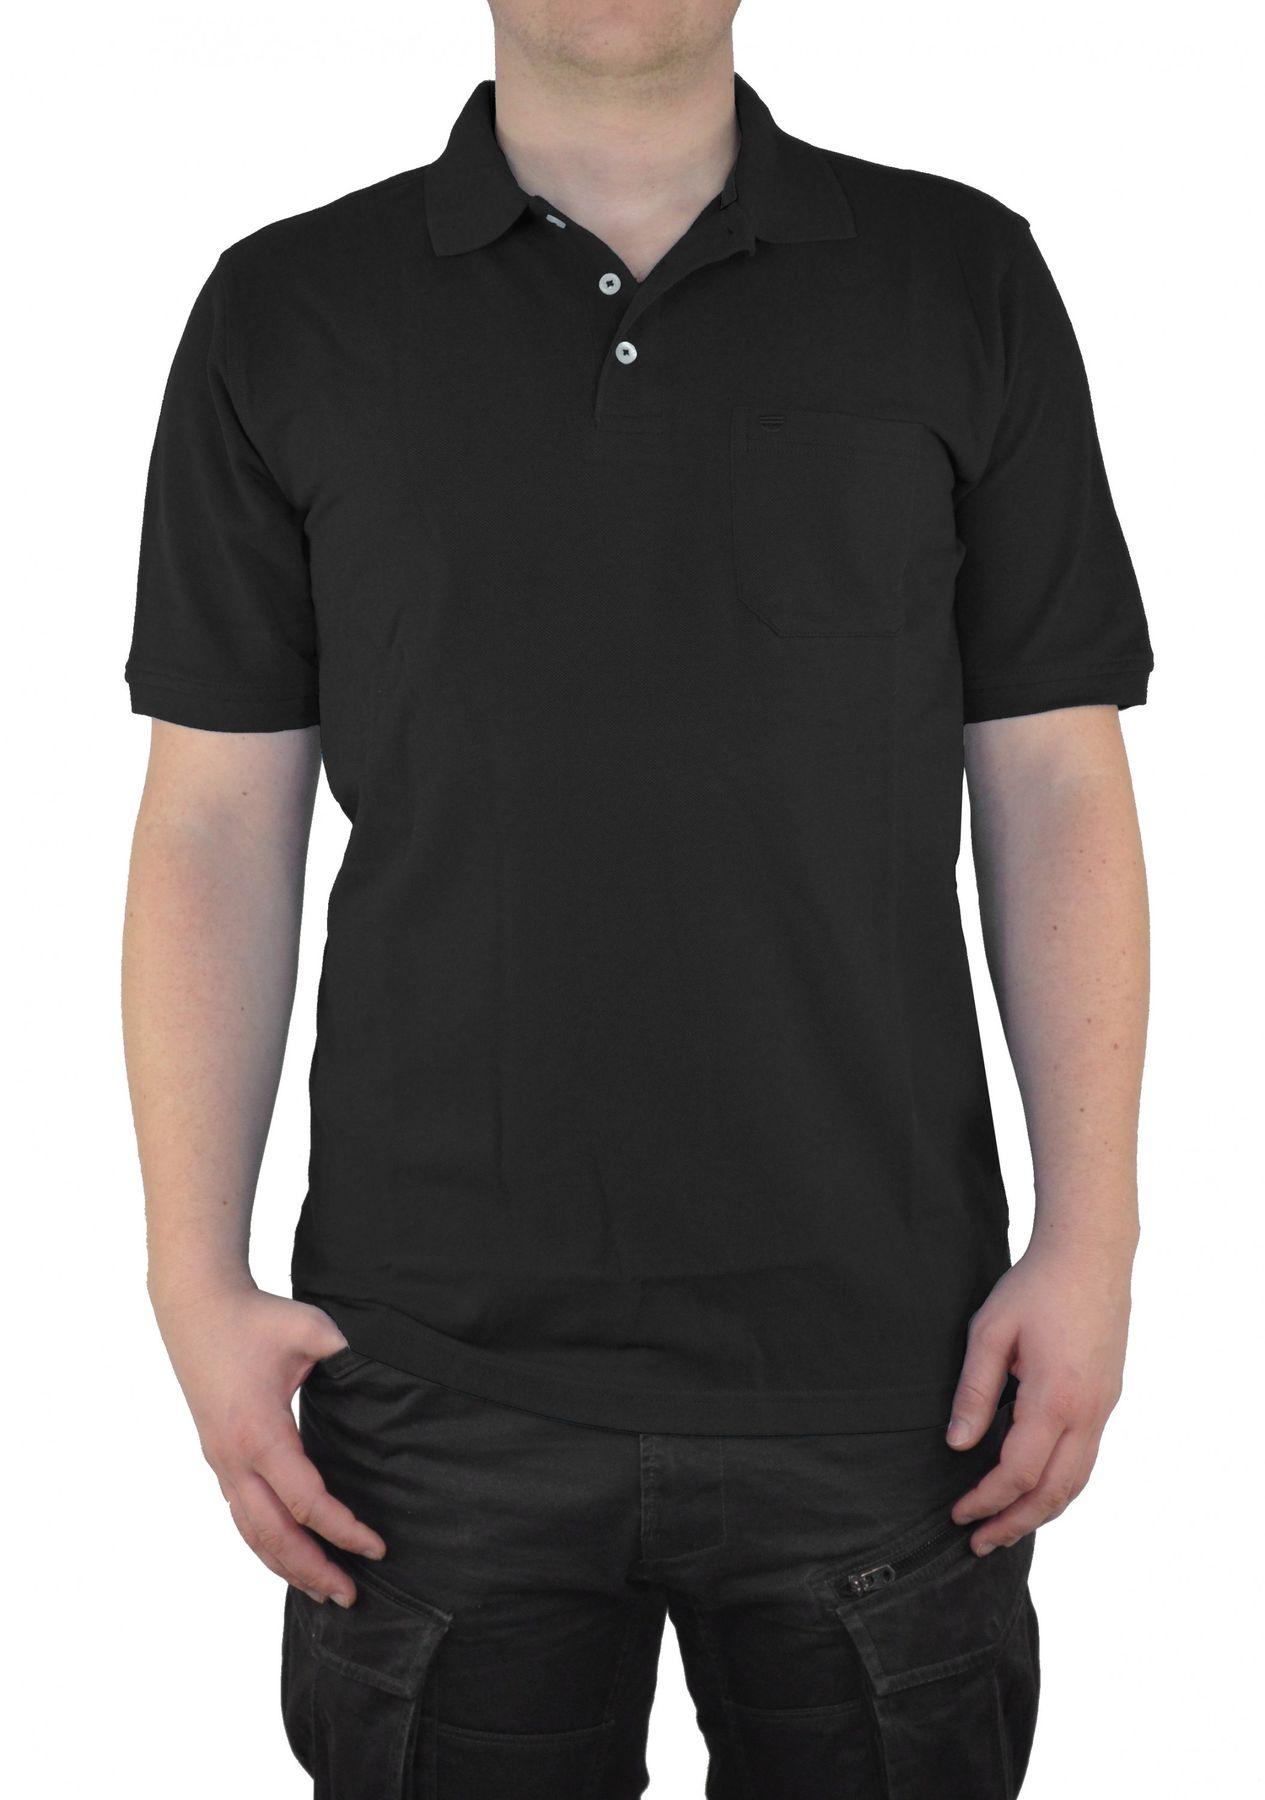 Redmond - Regular Fit - Herren Polo Shirt in verschiedenen Farben (900 A) – Bild 18